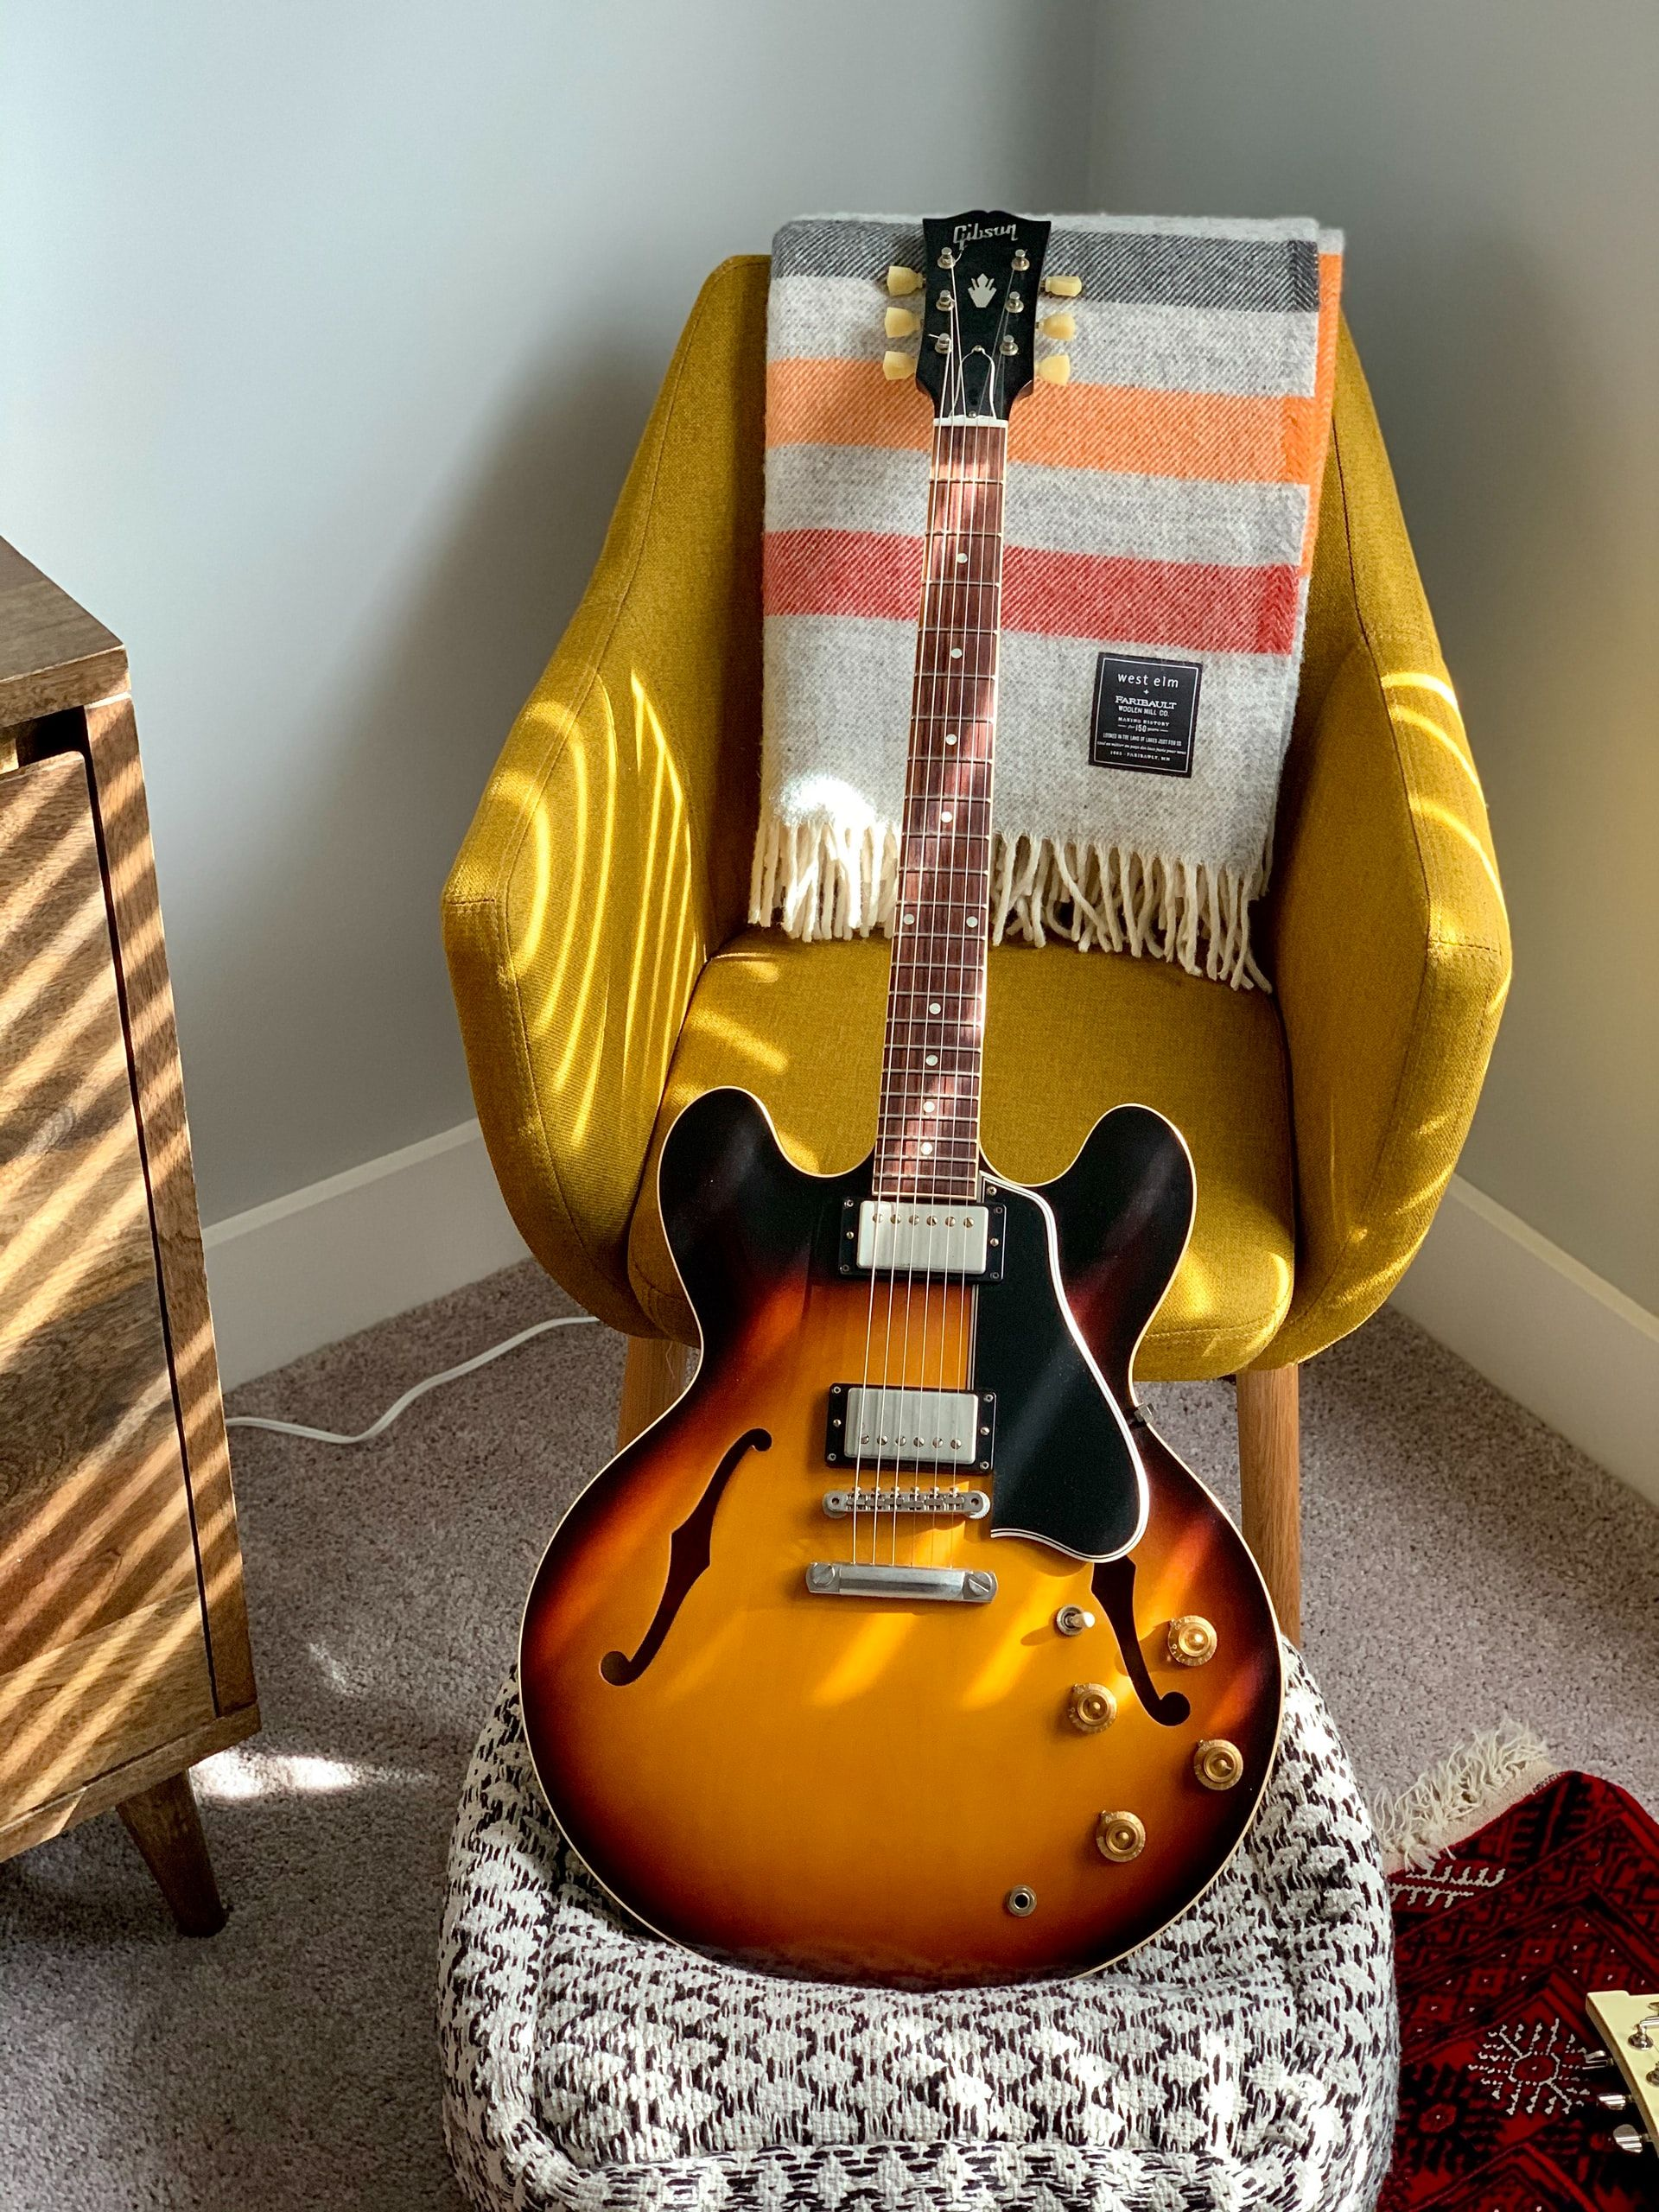 Guitars Stuff Blogs & Forums in 2020 Electric guitar